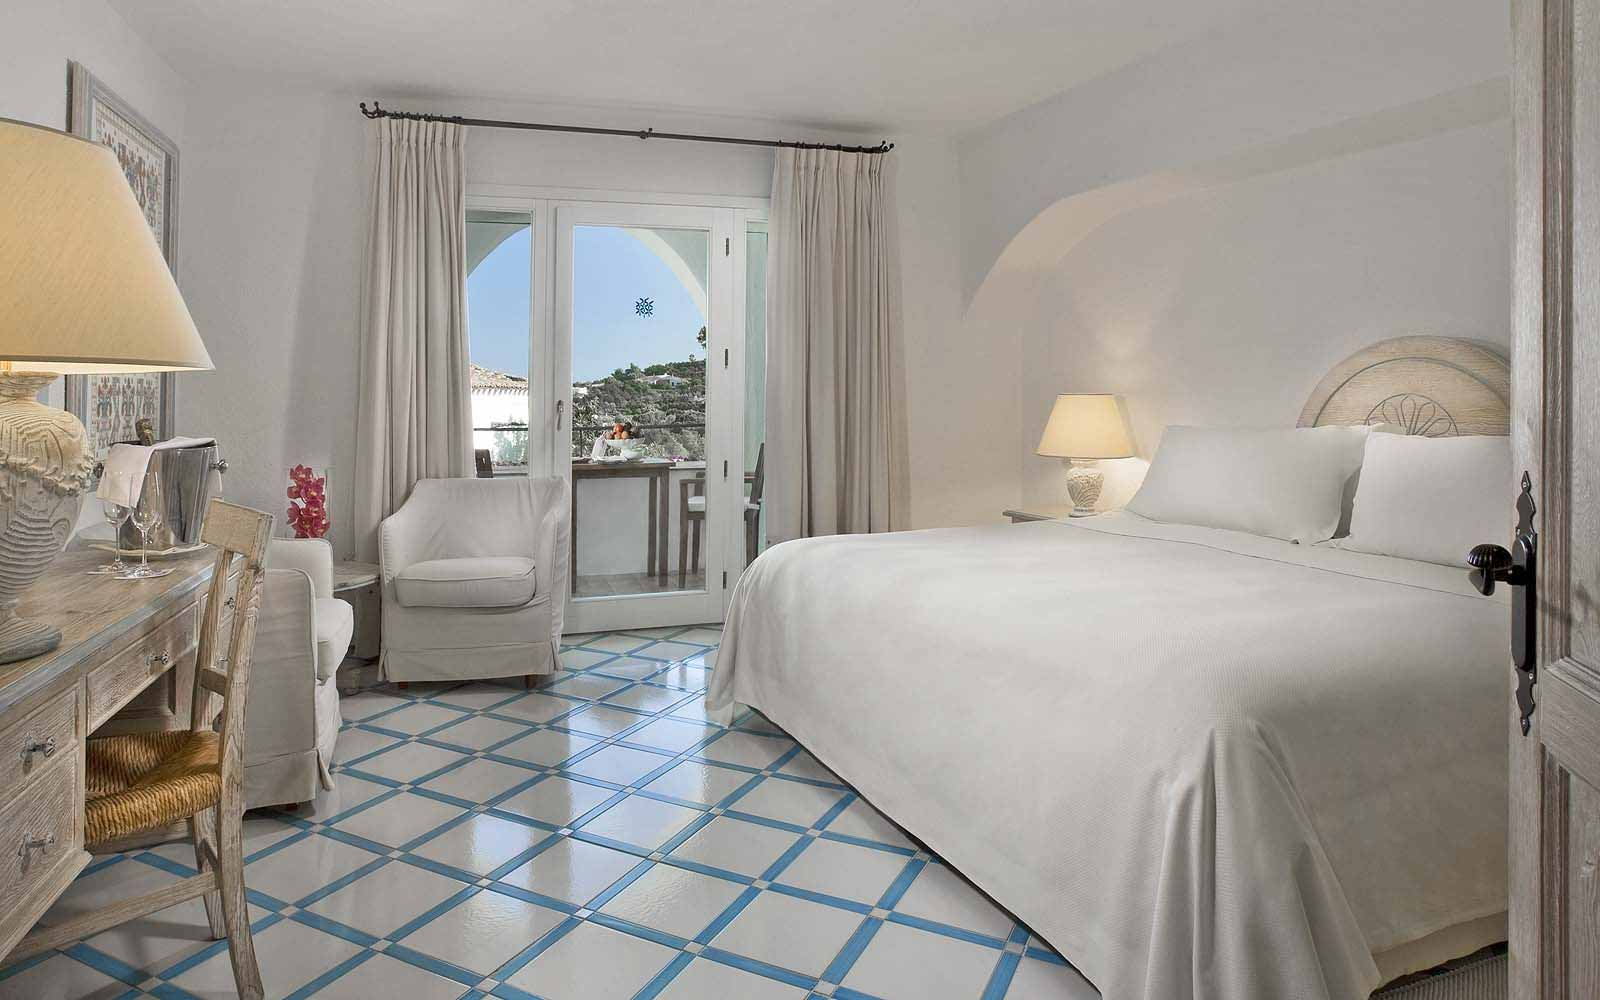 A Classic Room at the Hotel Romazzino